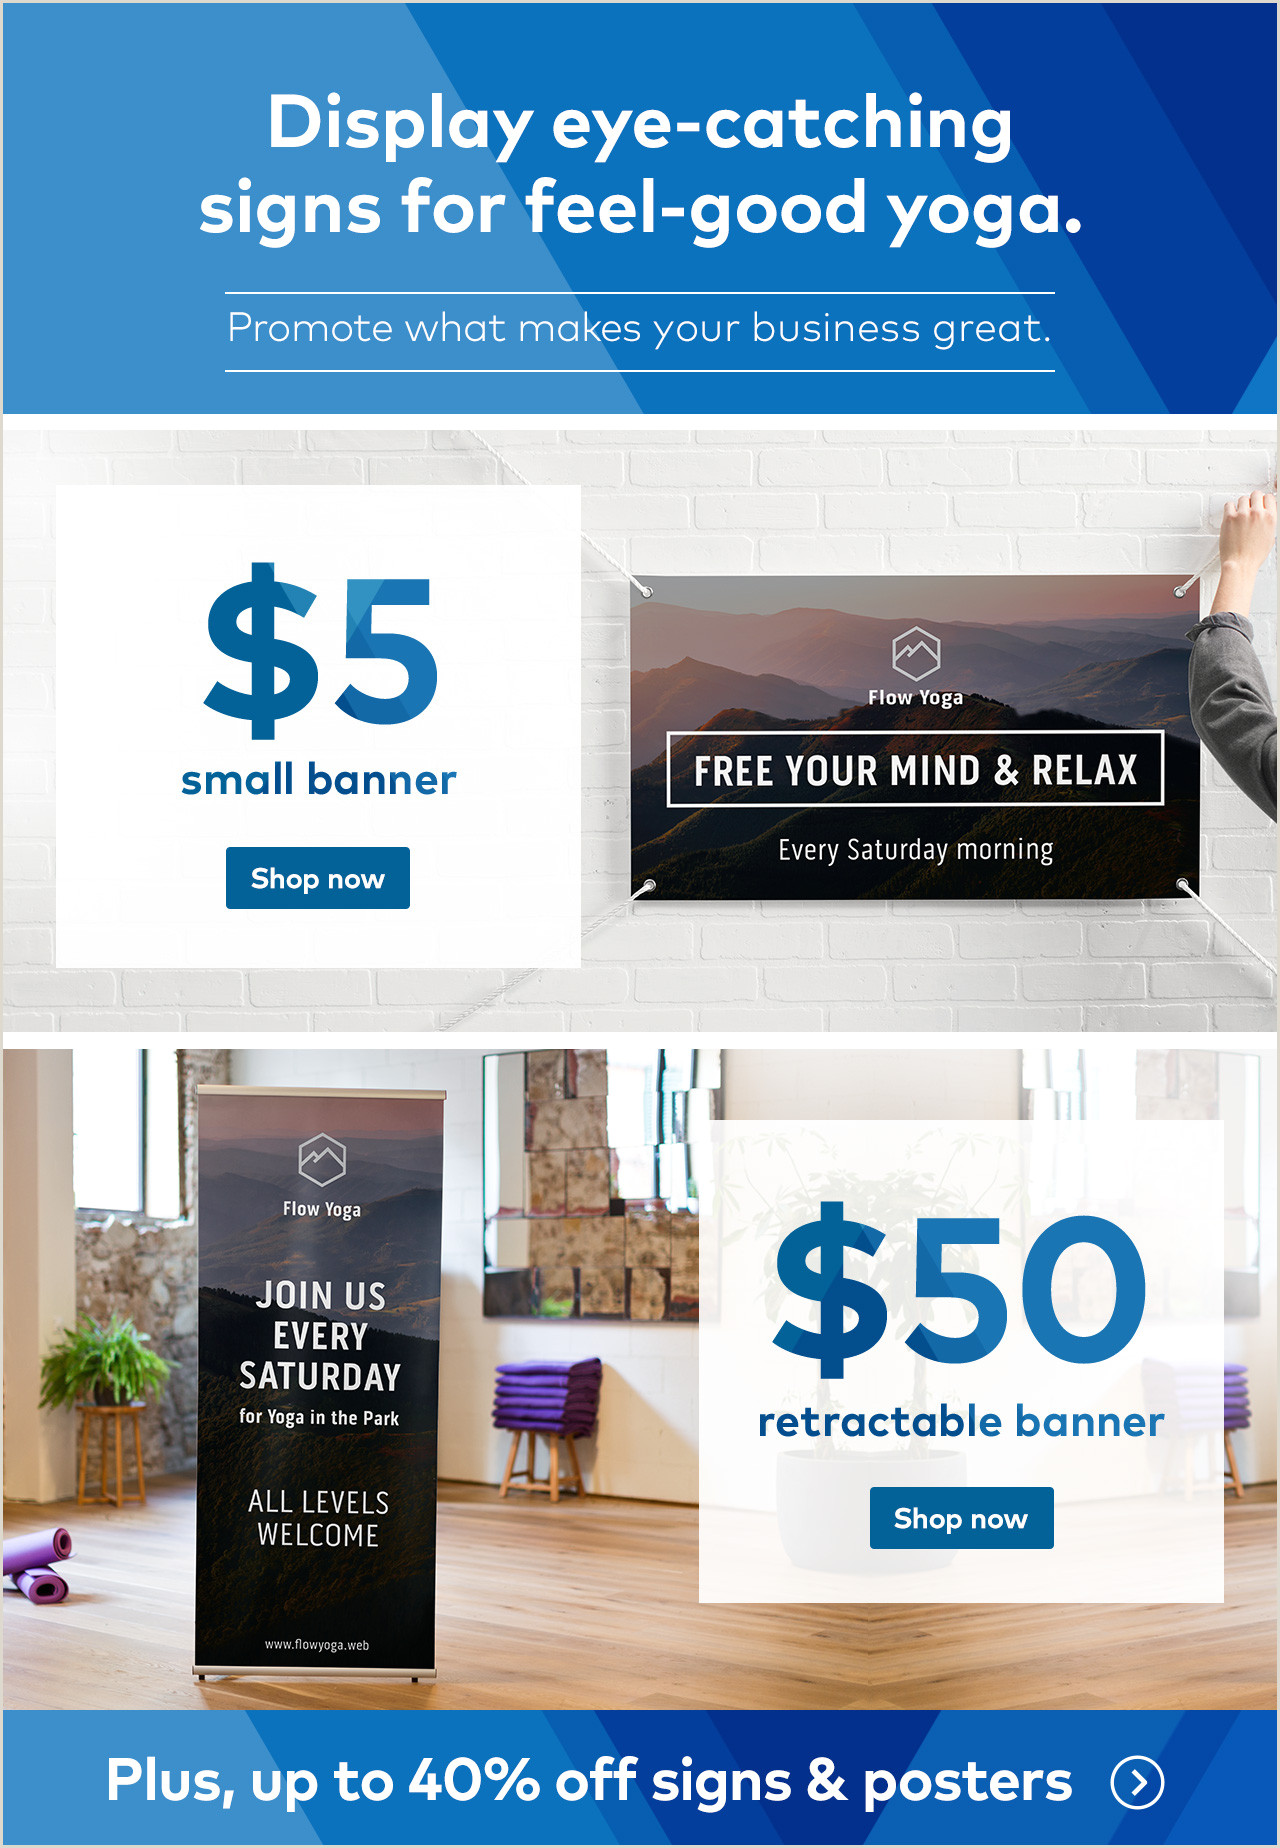 Retractable Banner Vistaprint Vistaprint Ends Tonight $5 Small Banner $50 Retractable